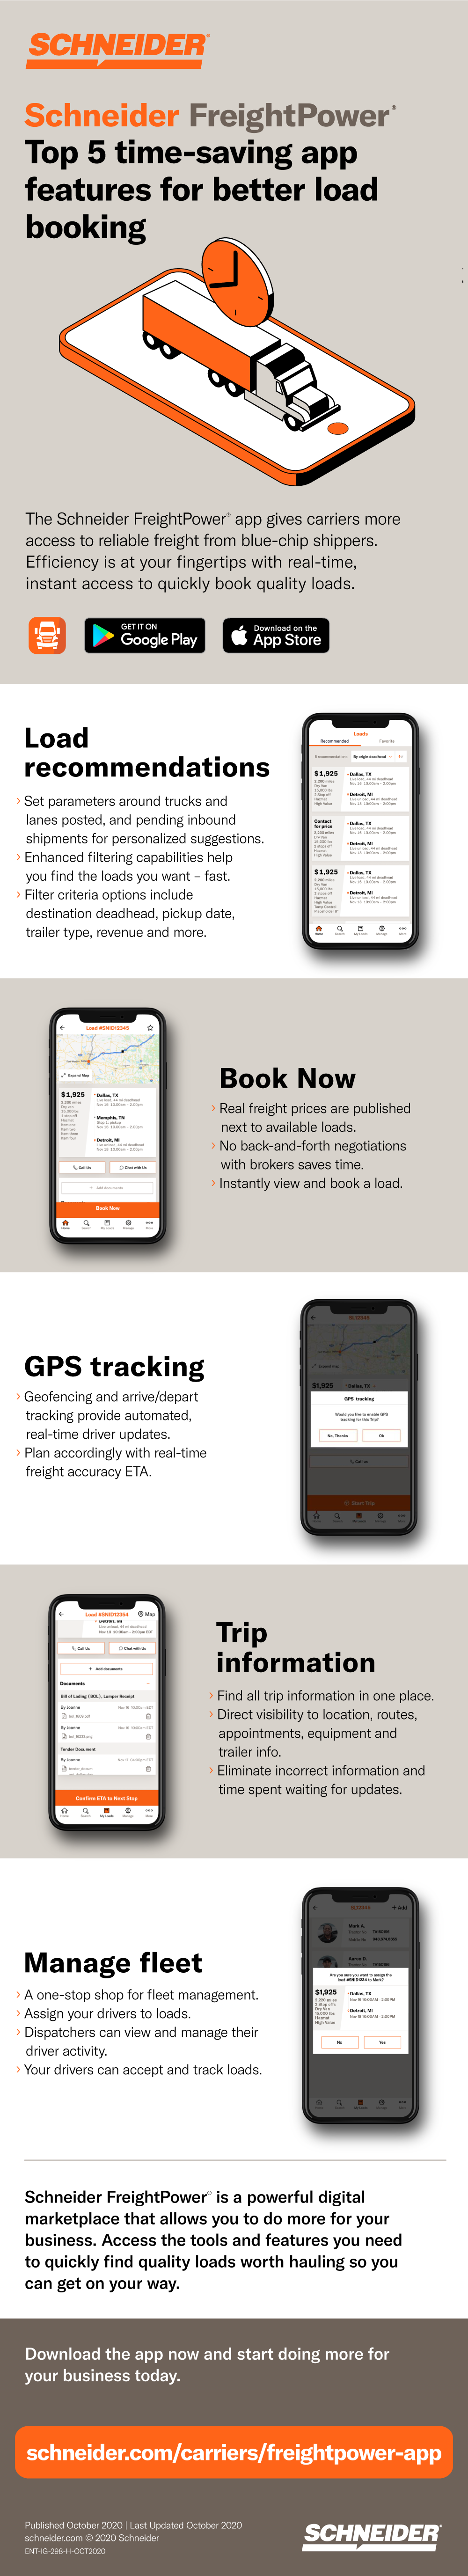 infographic of Schneider FreightPower app for carriers